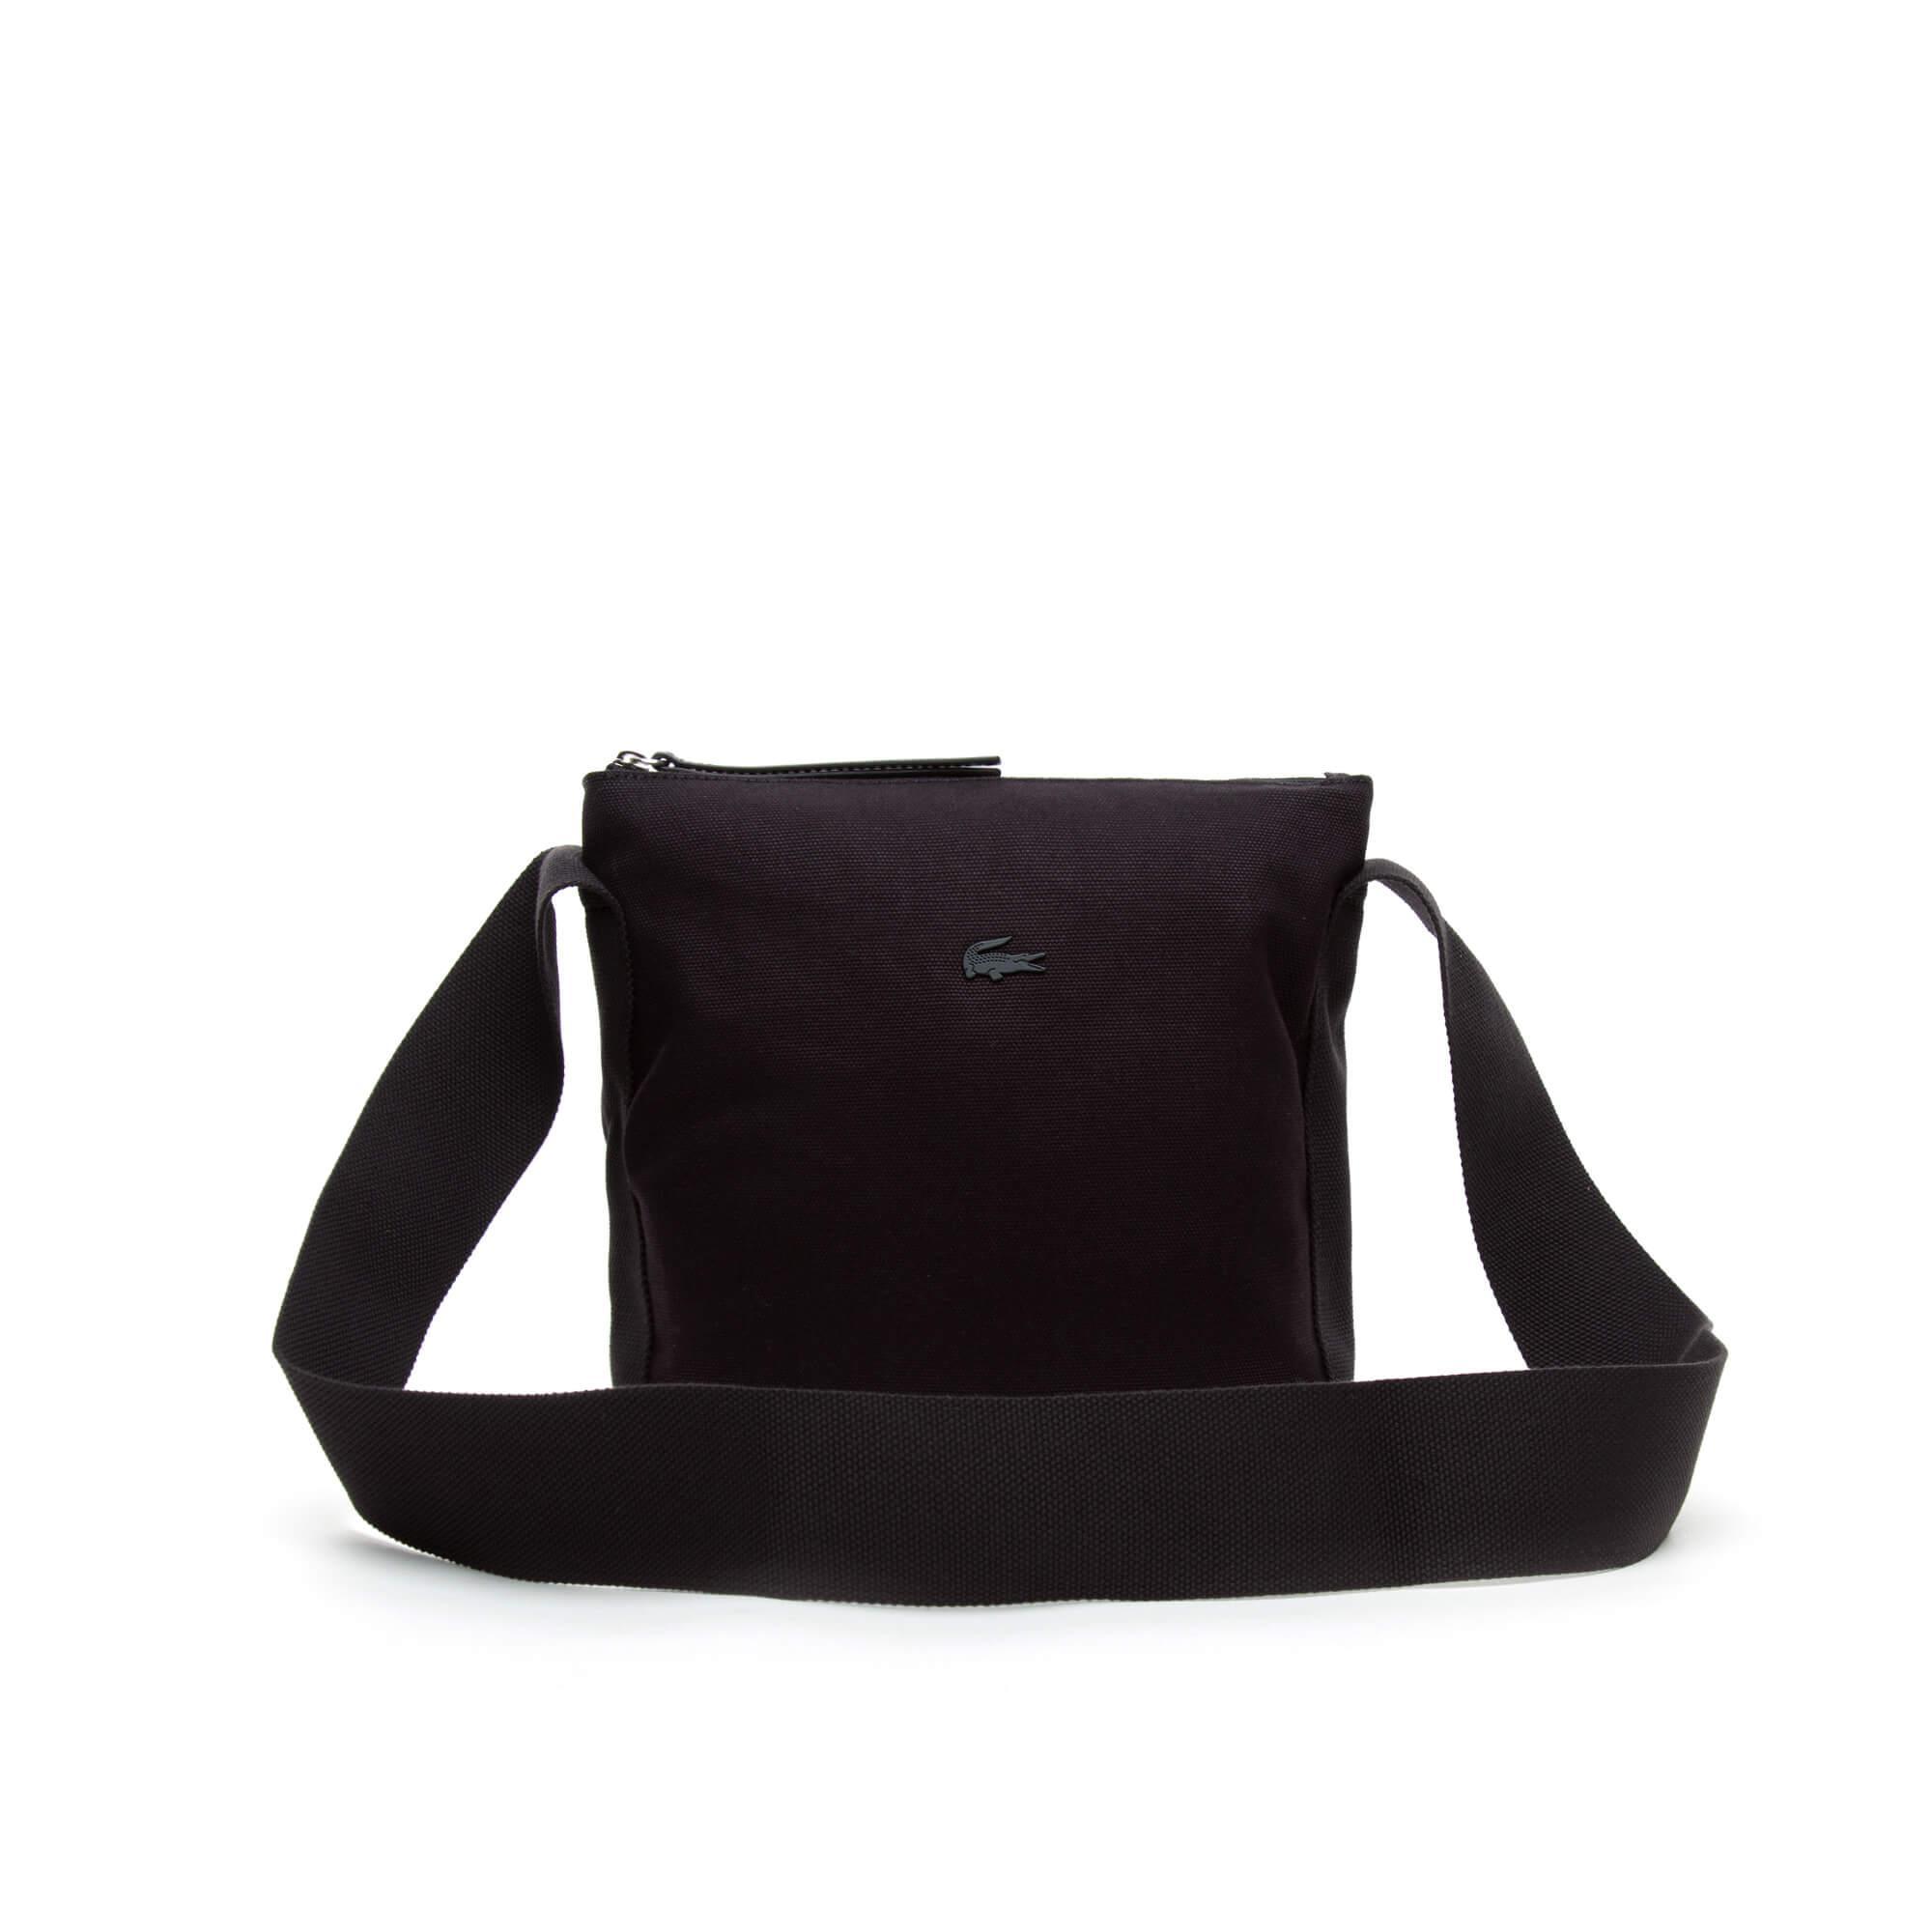 Lacoste Kadın Suzie Lacivert Çanta